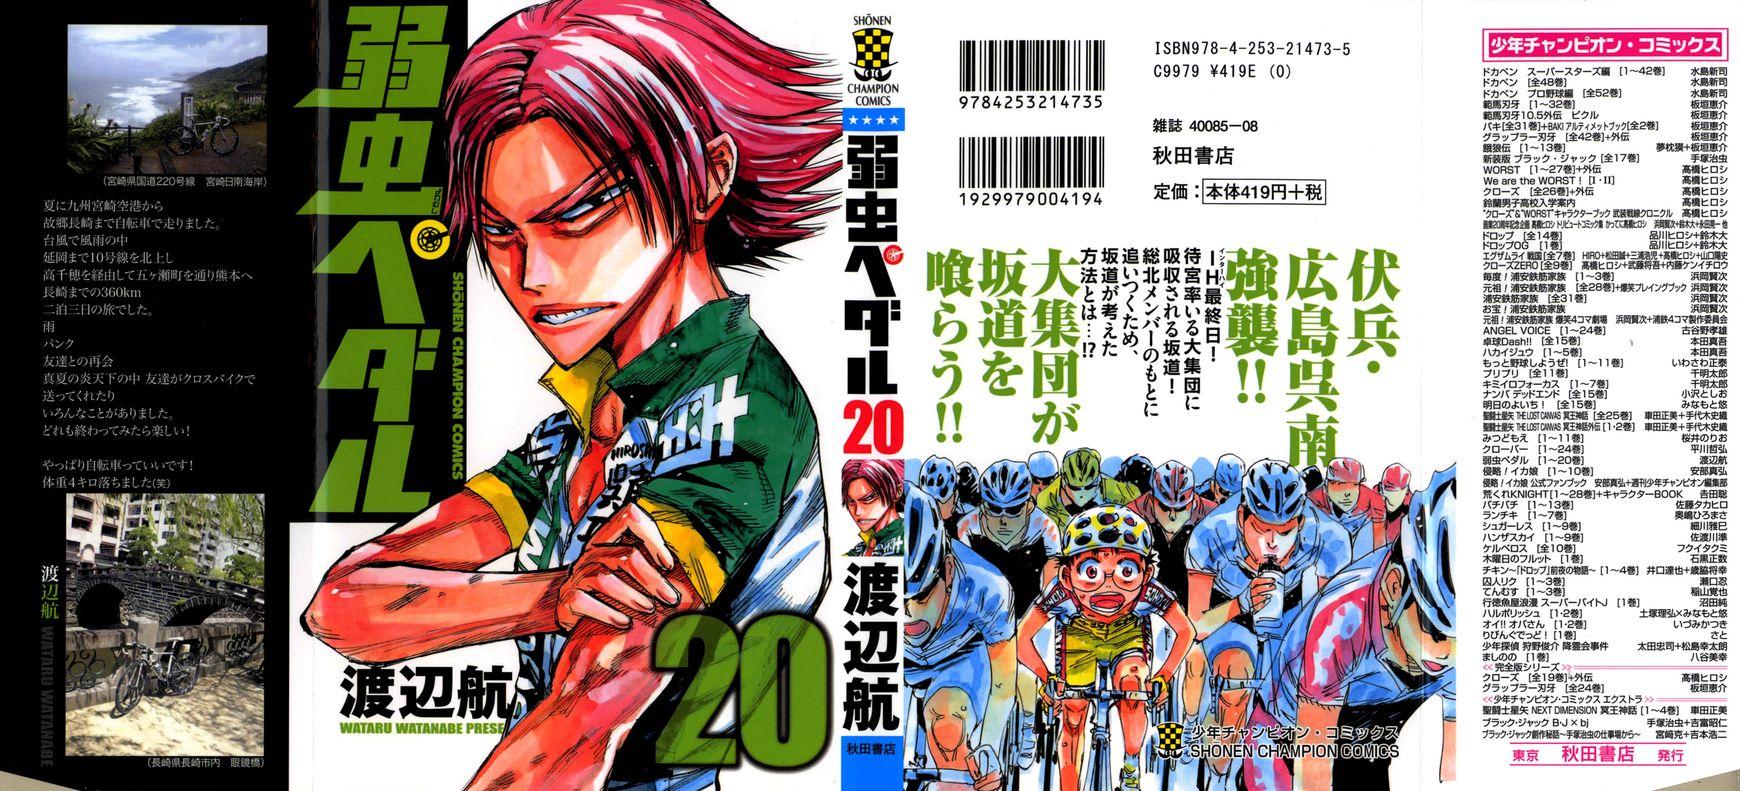 Yowamushi Pedal 164 Page 1